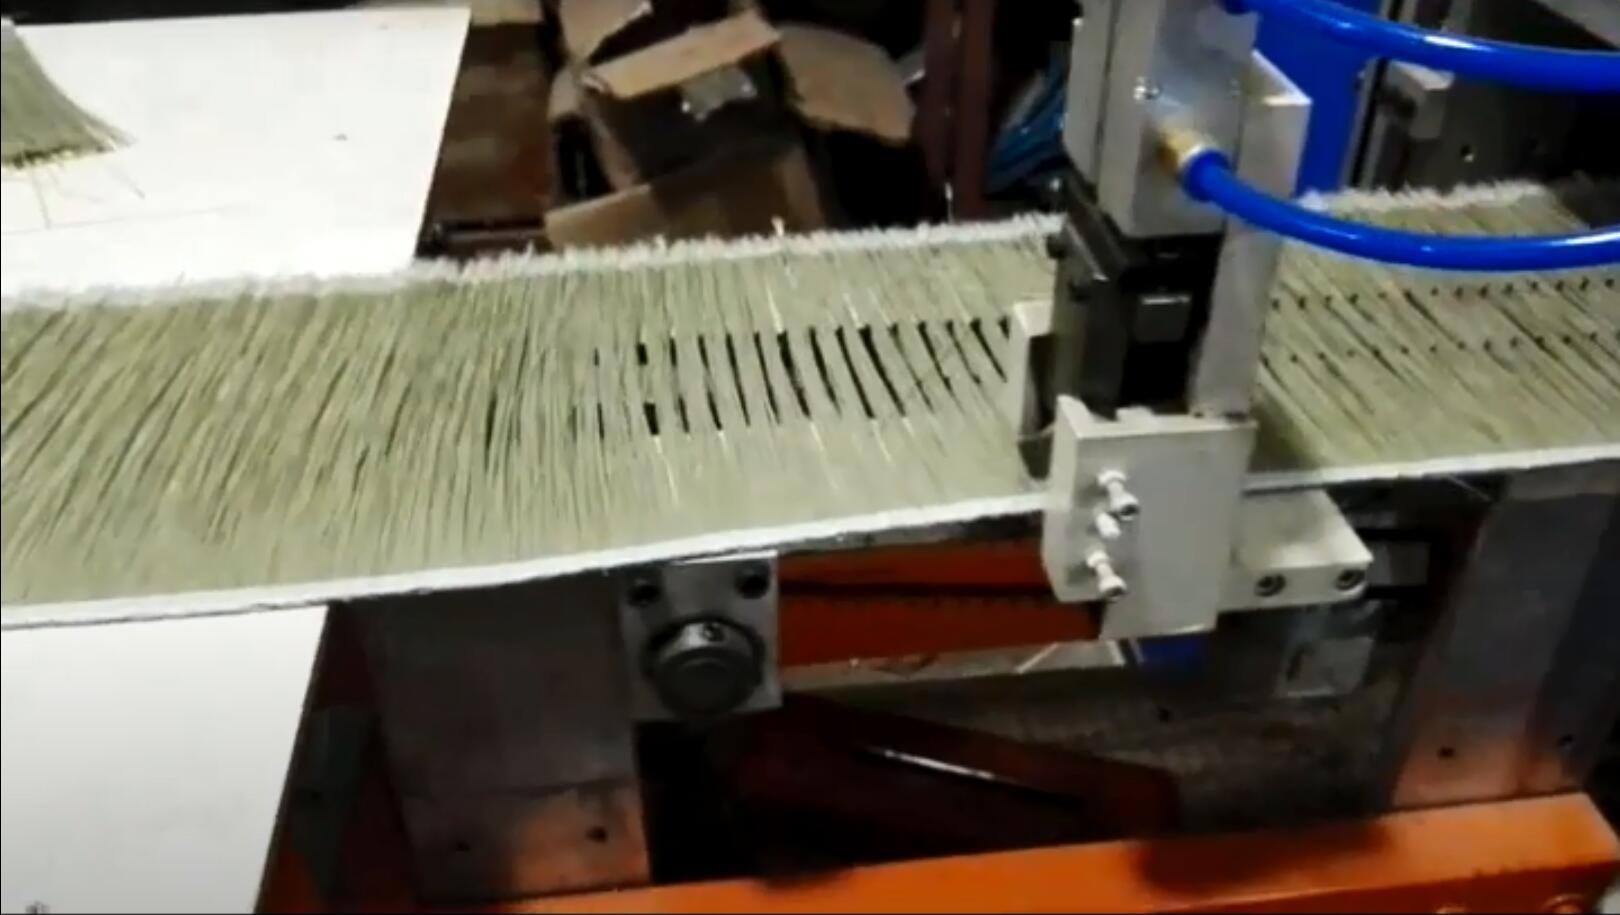 Mei Xin CNC India hot sales Phool Jhadu brush machine manufactuer broom making machine